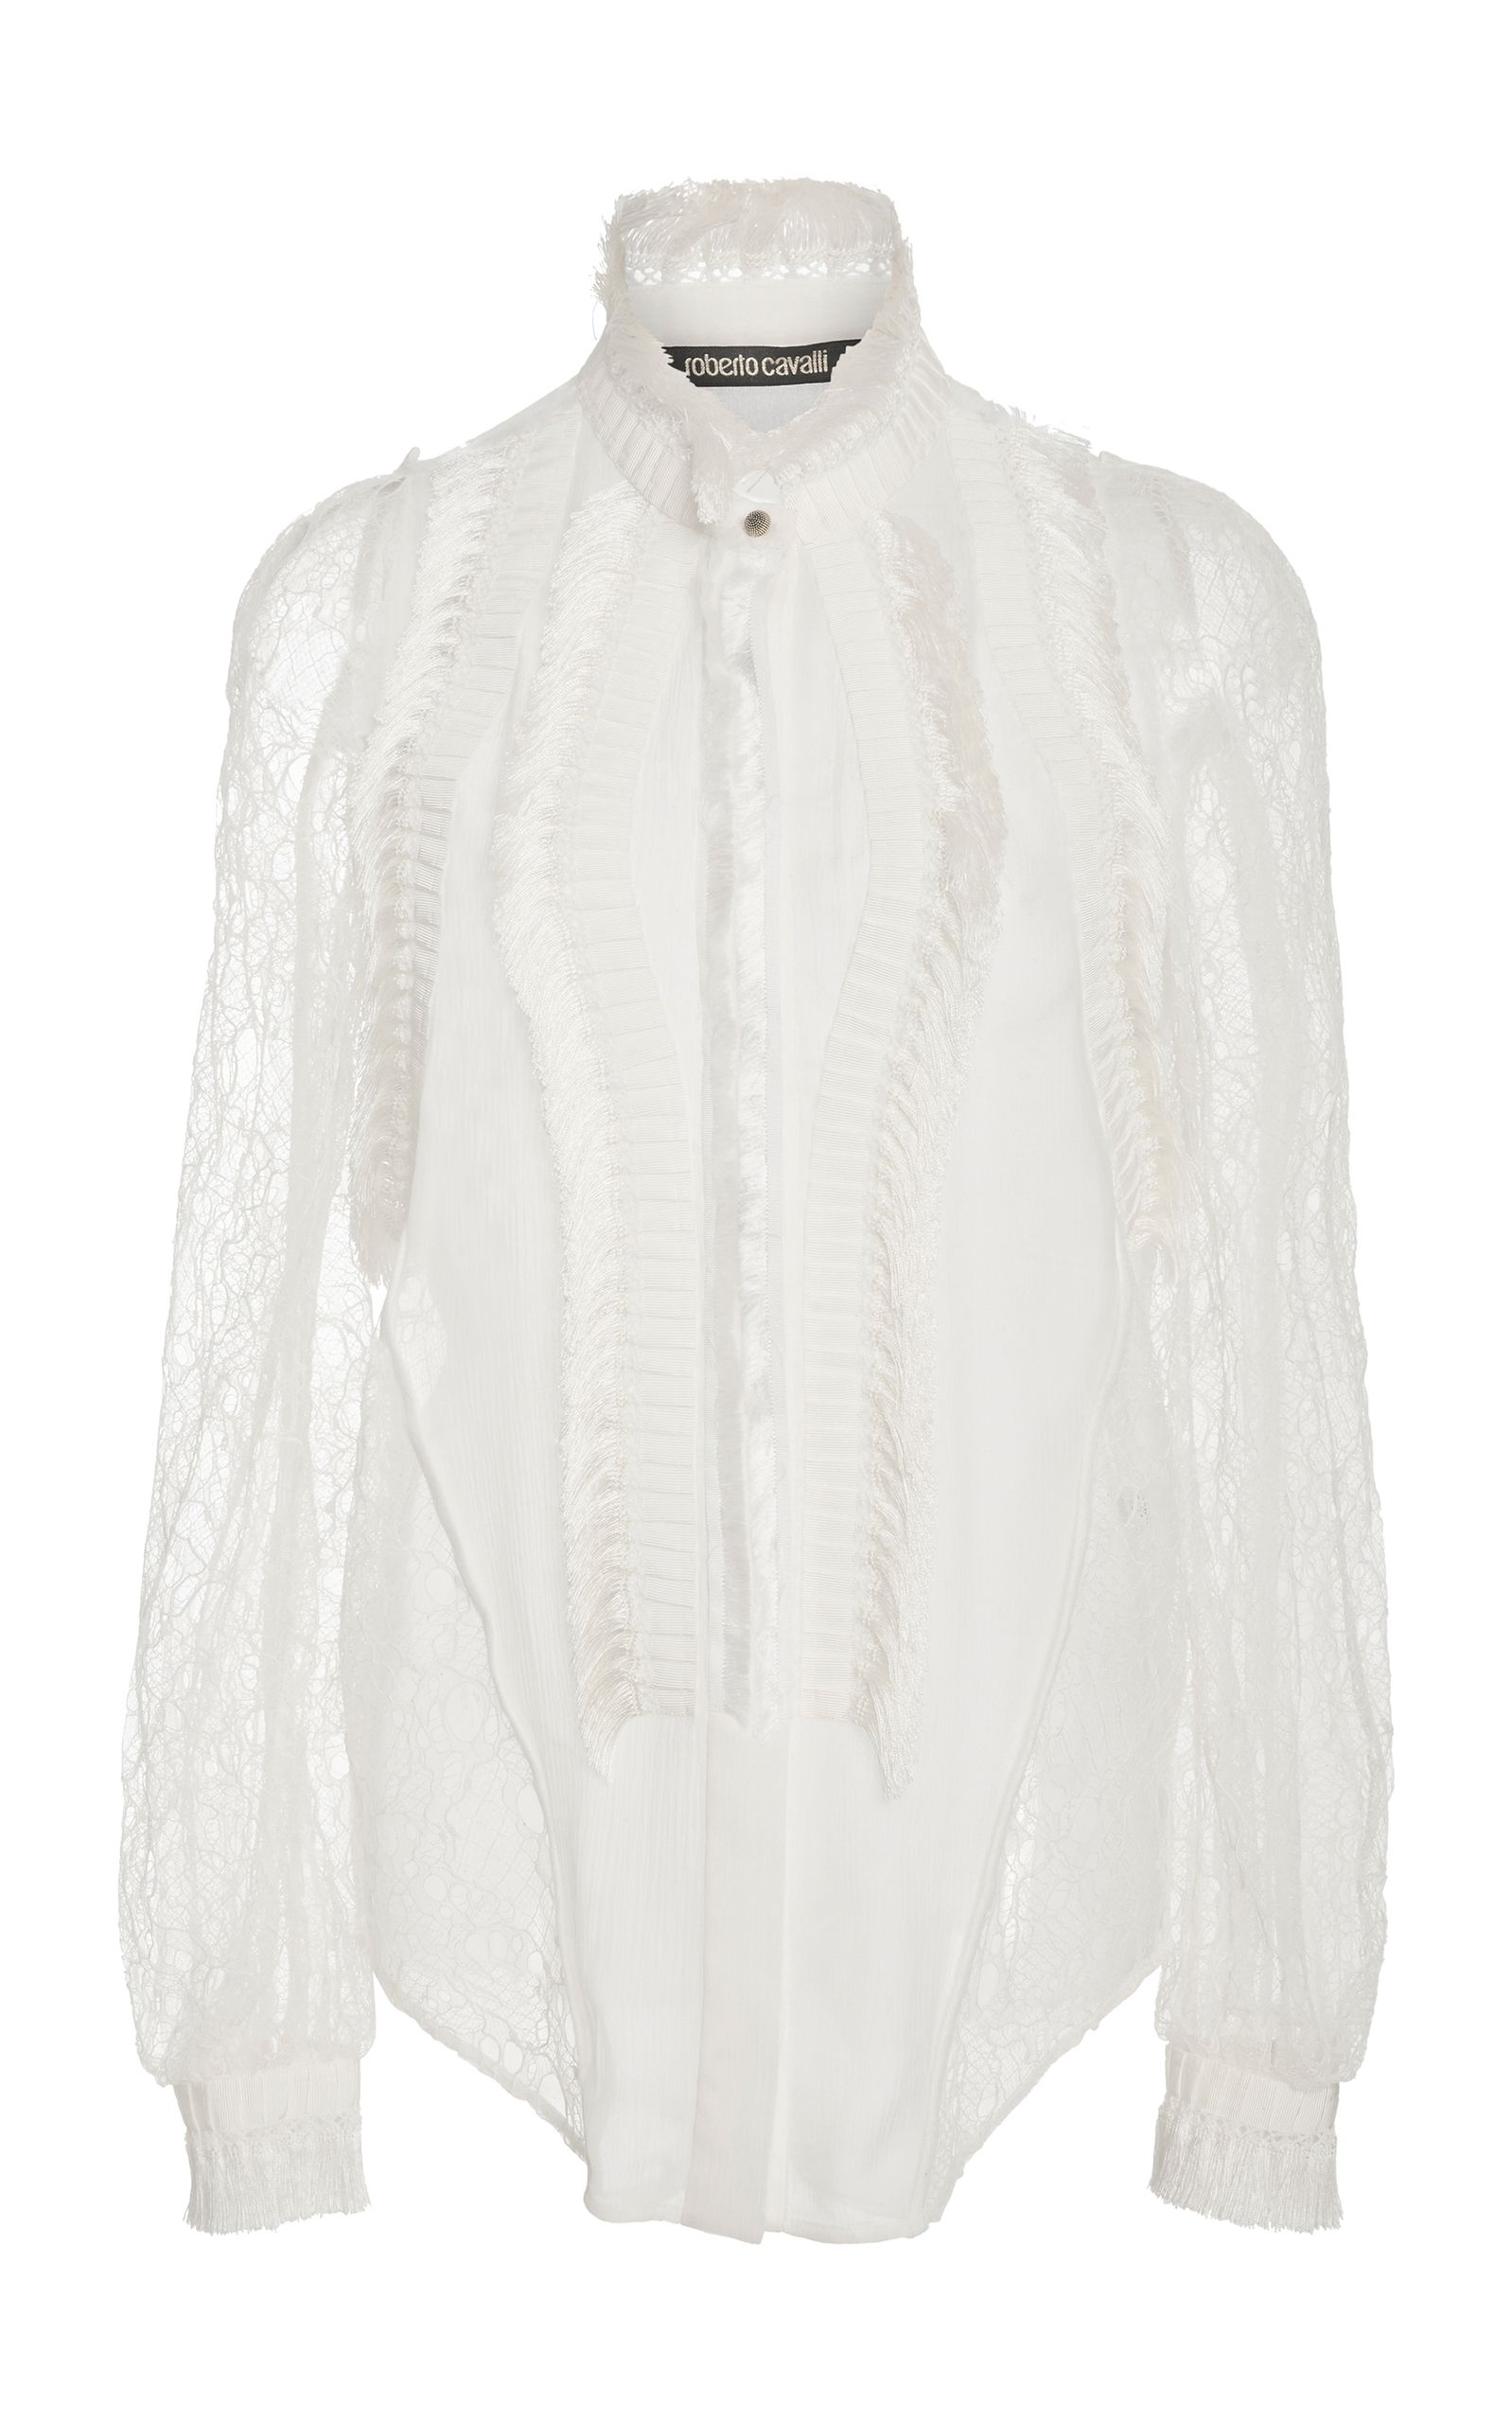 f0b18452327 Lace-Paneled Silk Blouse by ROBERTO CAVALLI Now Available on Moda Operandi